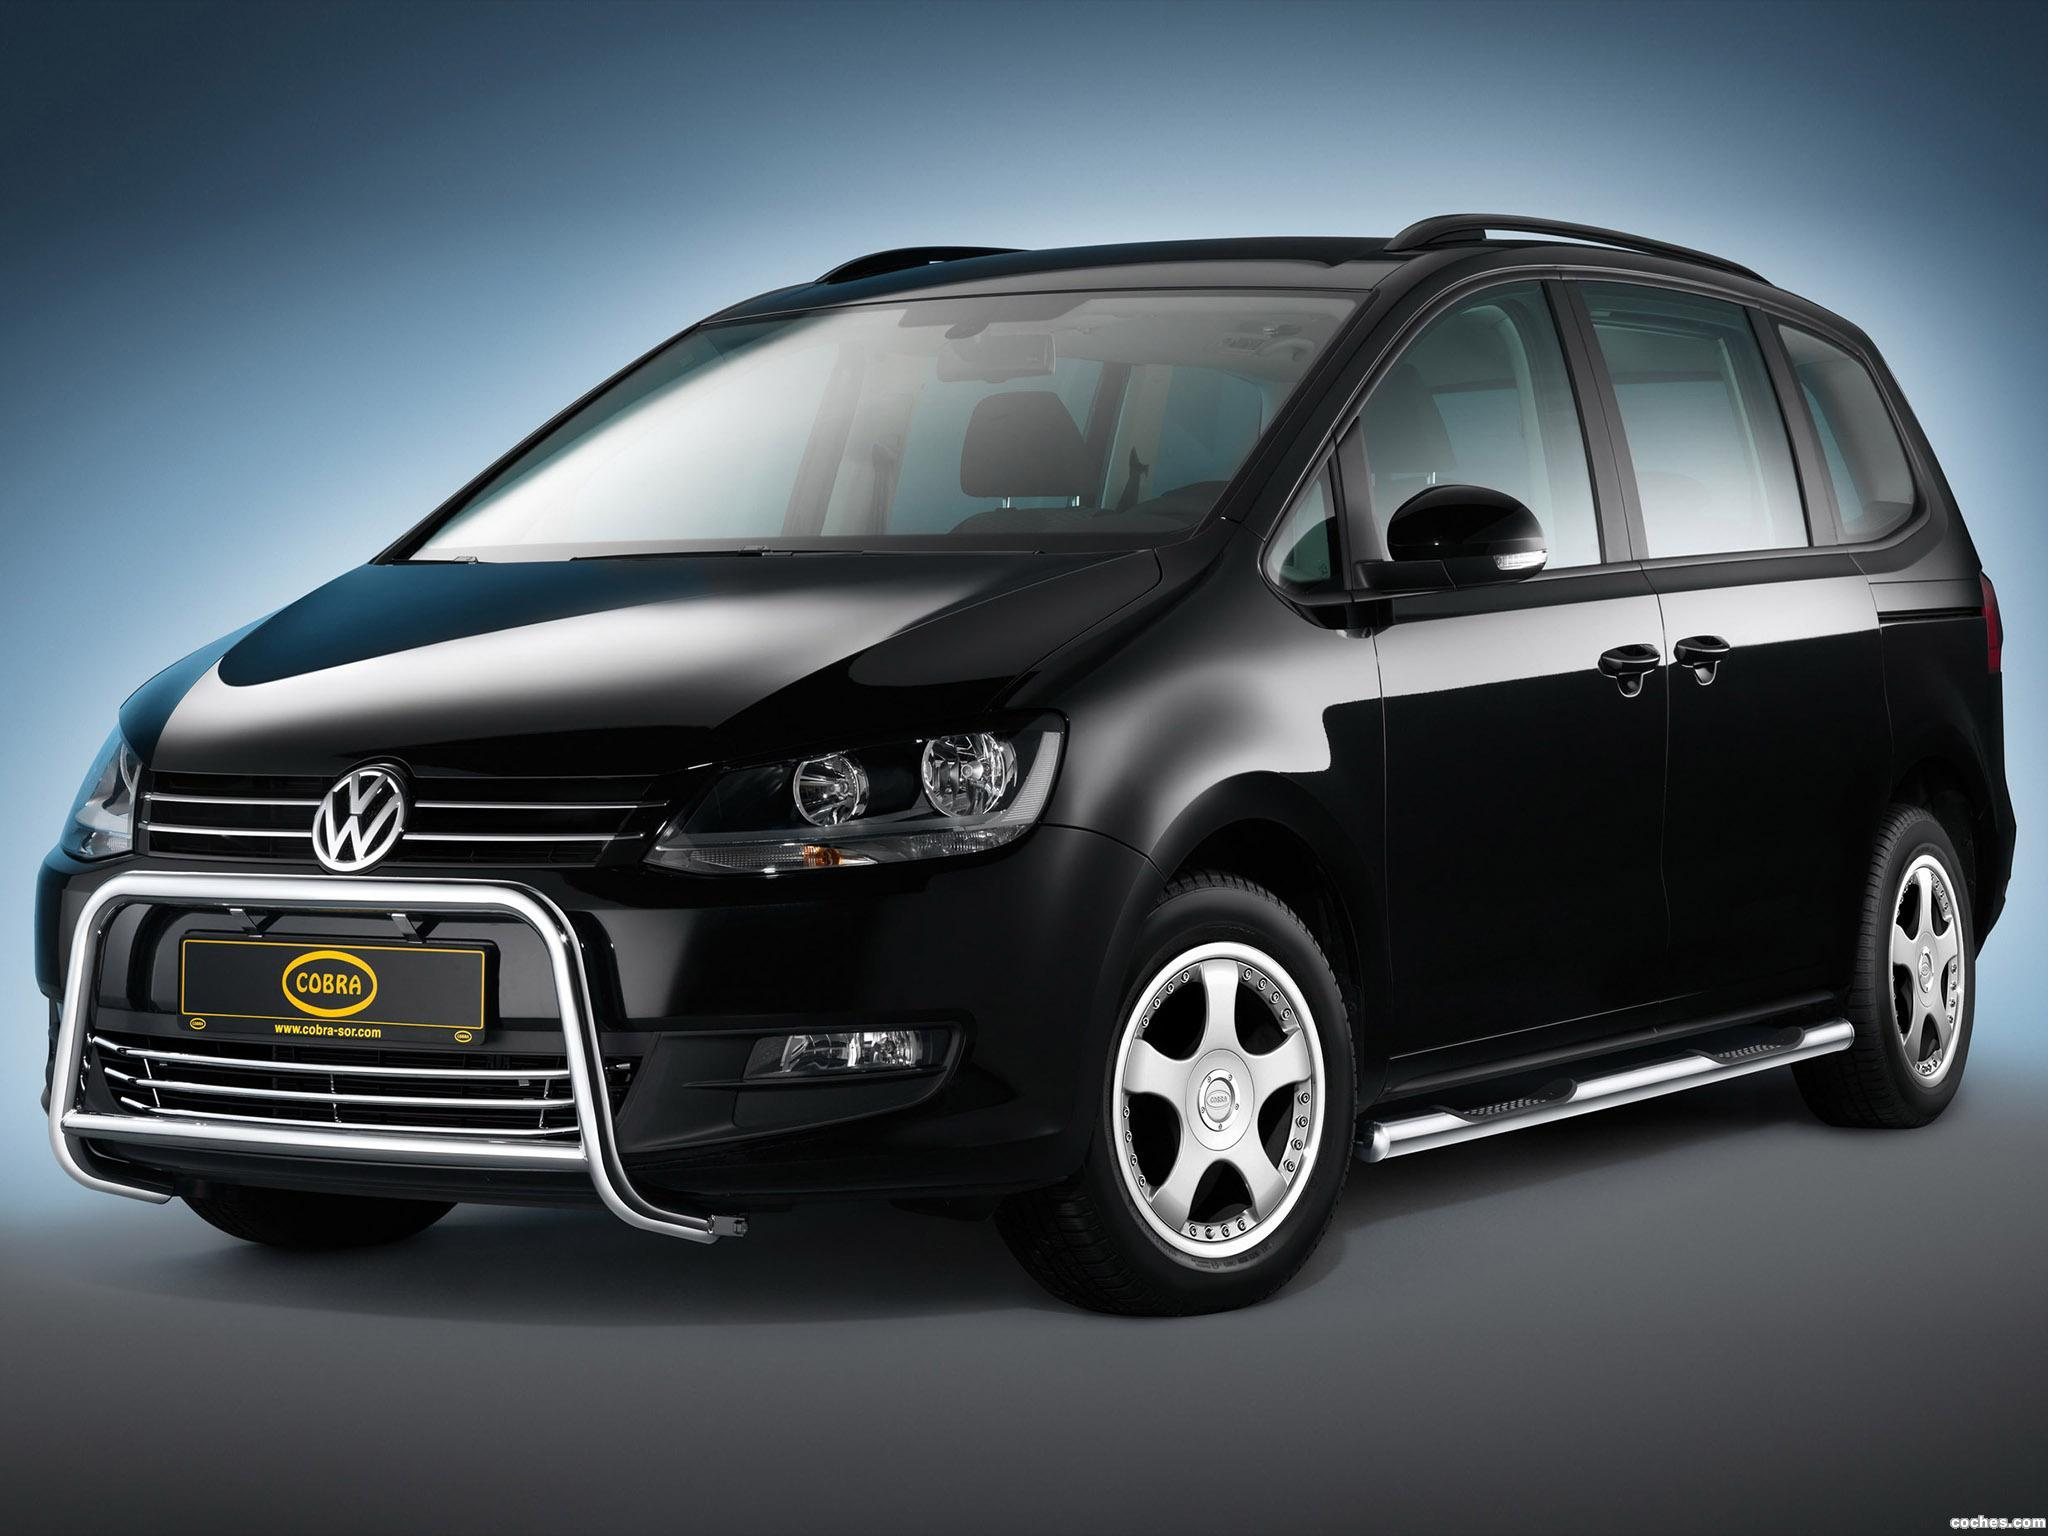 Foto 0 de Cobra Volkswagen Sharan 2011